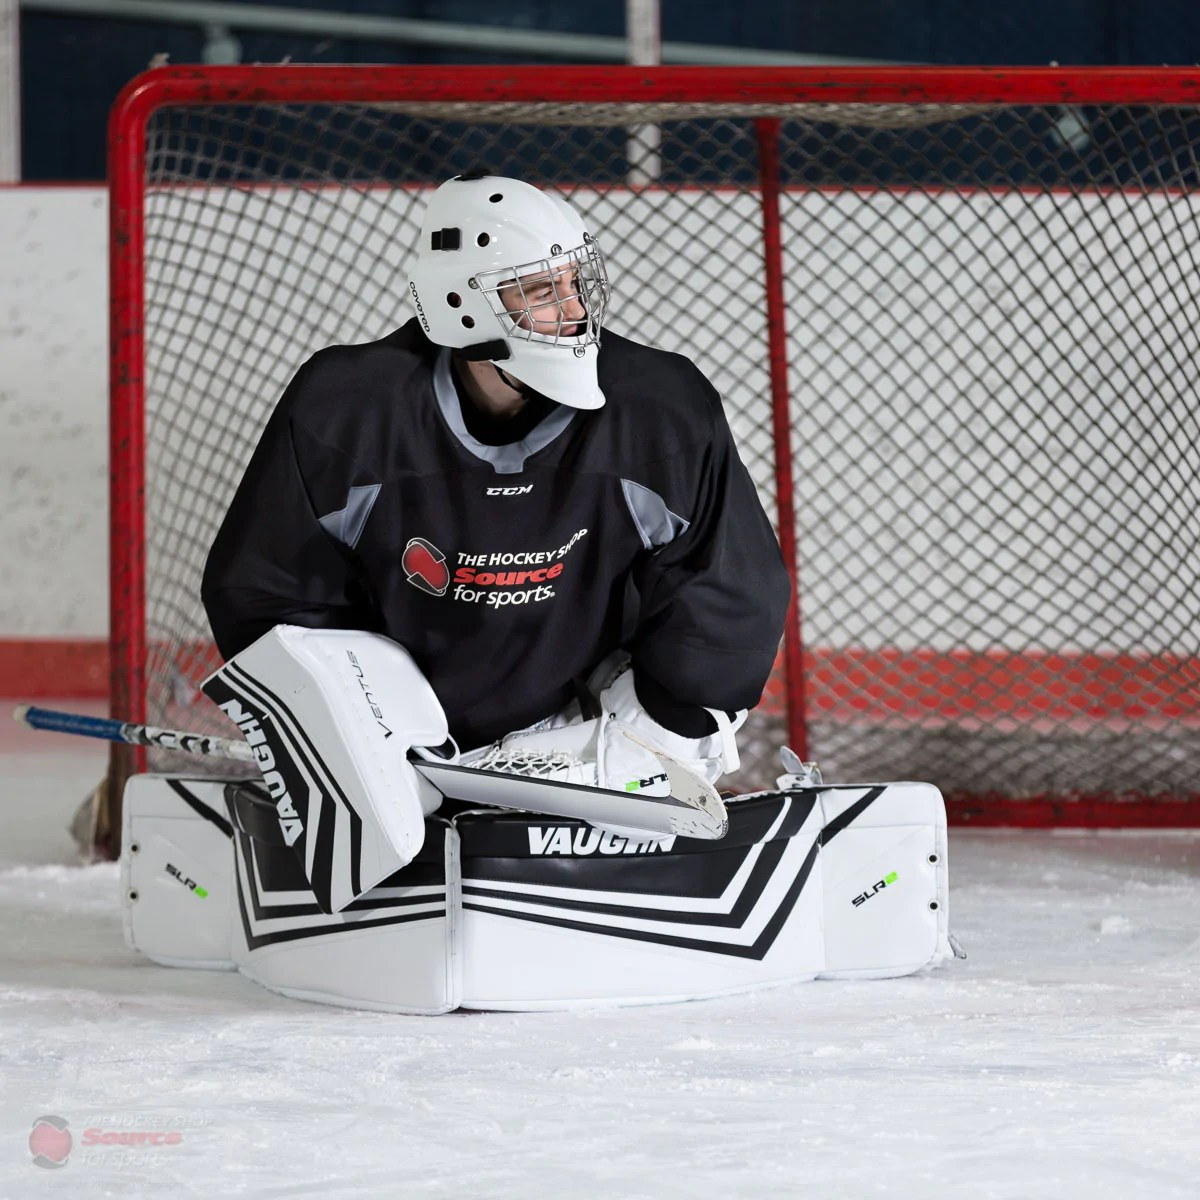 Vaughn Slr2 Pro Carbon Leg Pad Review The Hockey Shop